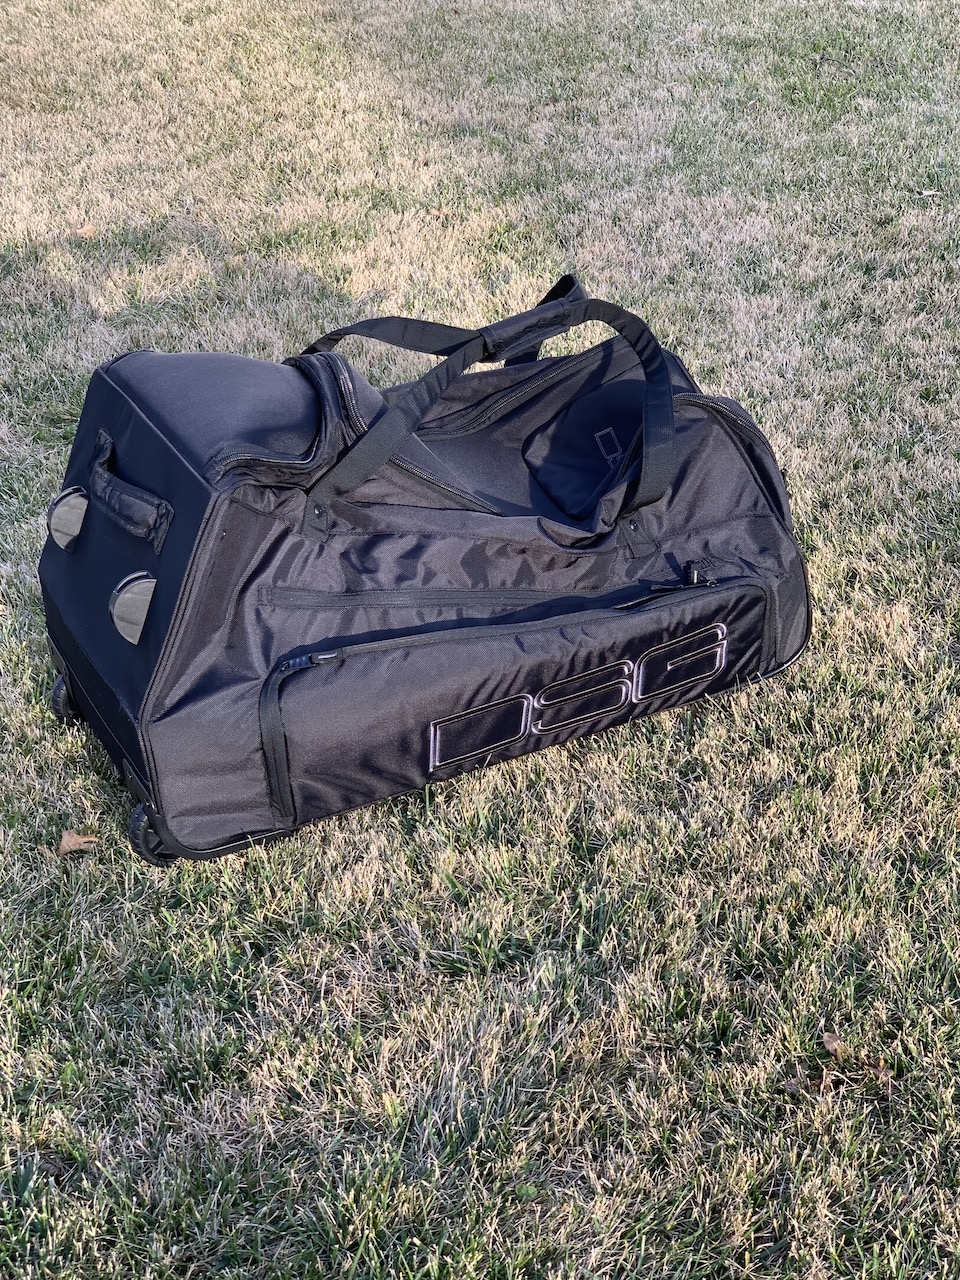 DSG Roller Bag